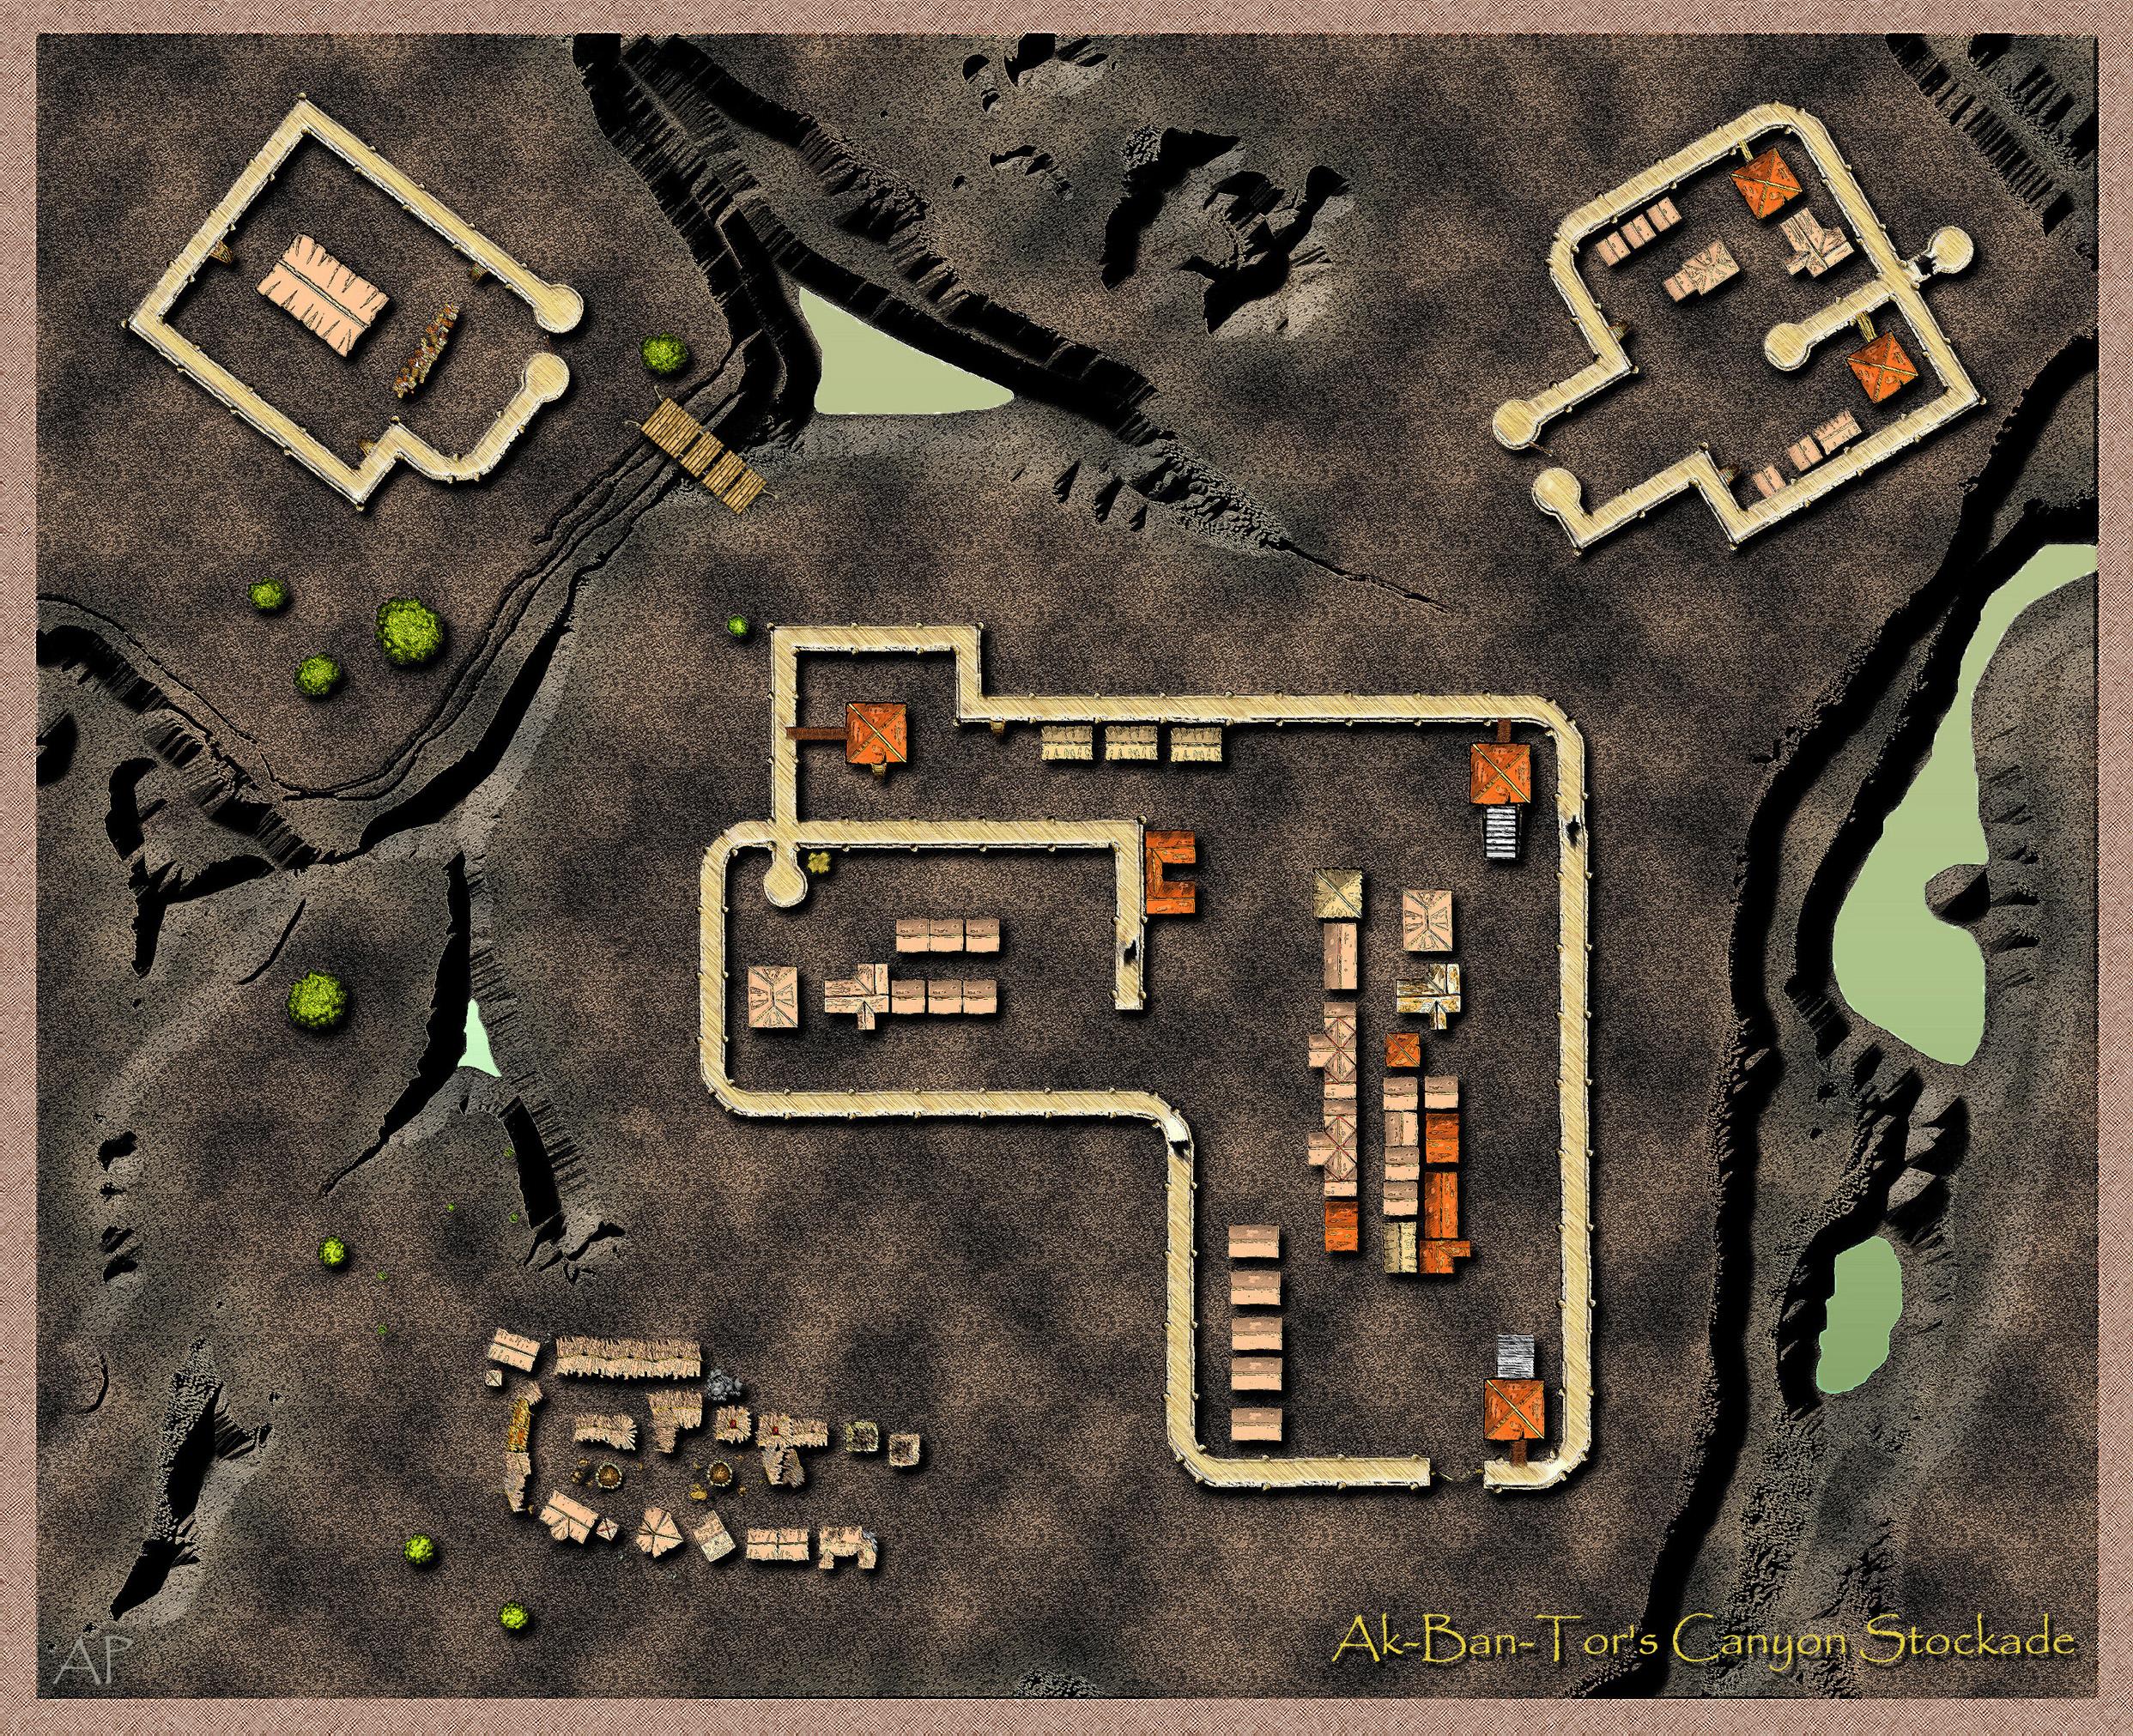 Ak-Ban Tor's Cany